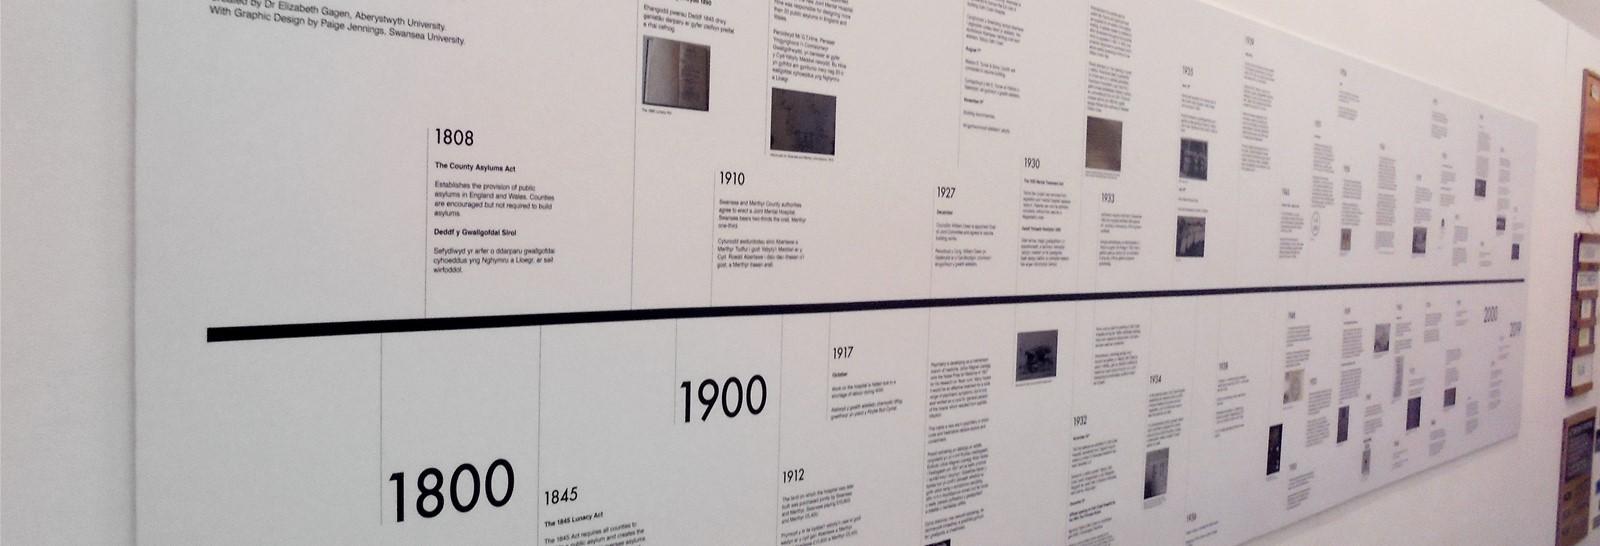 Exhibition Timeline